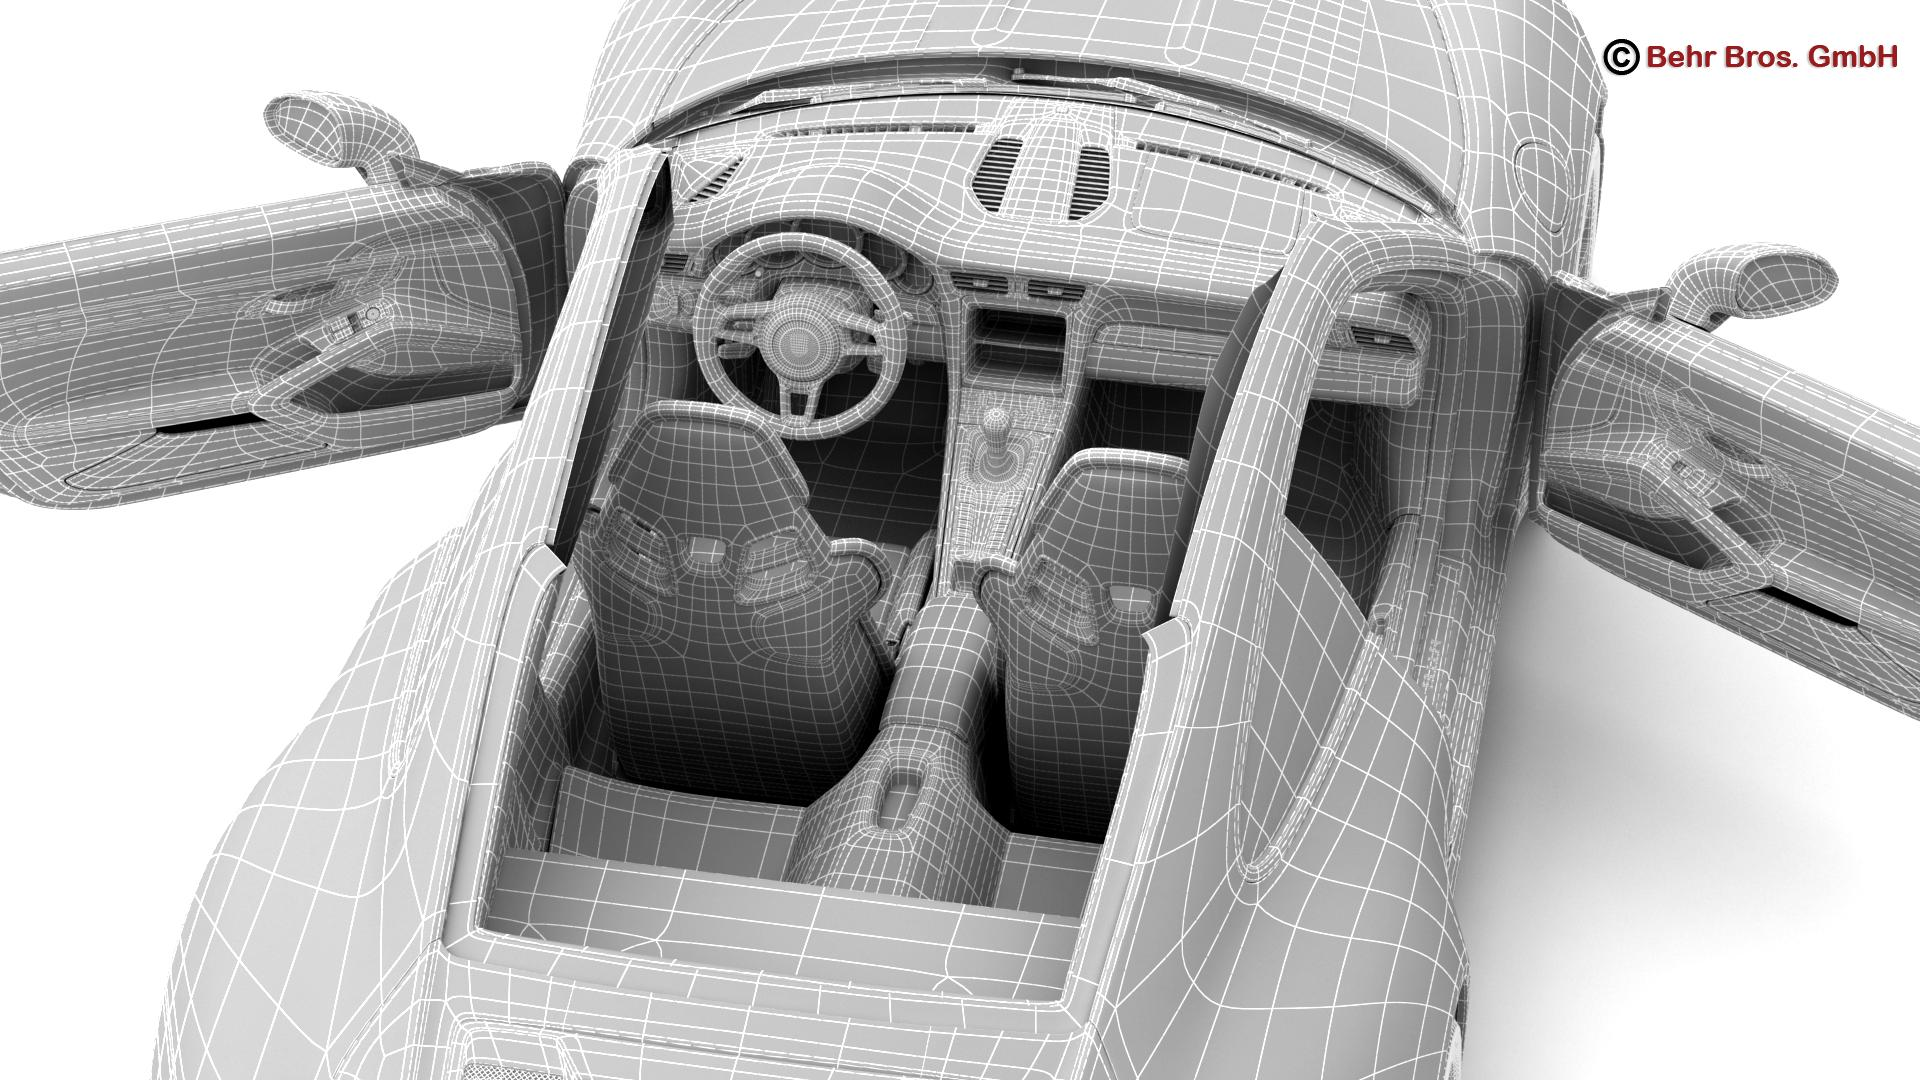 porsche 911 r 2017 3d model 3ds max fbx c4d lwo ma mb obj 220026